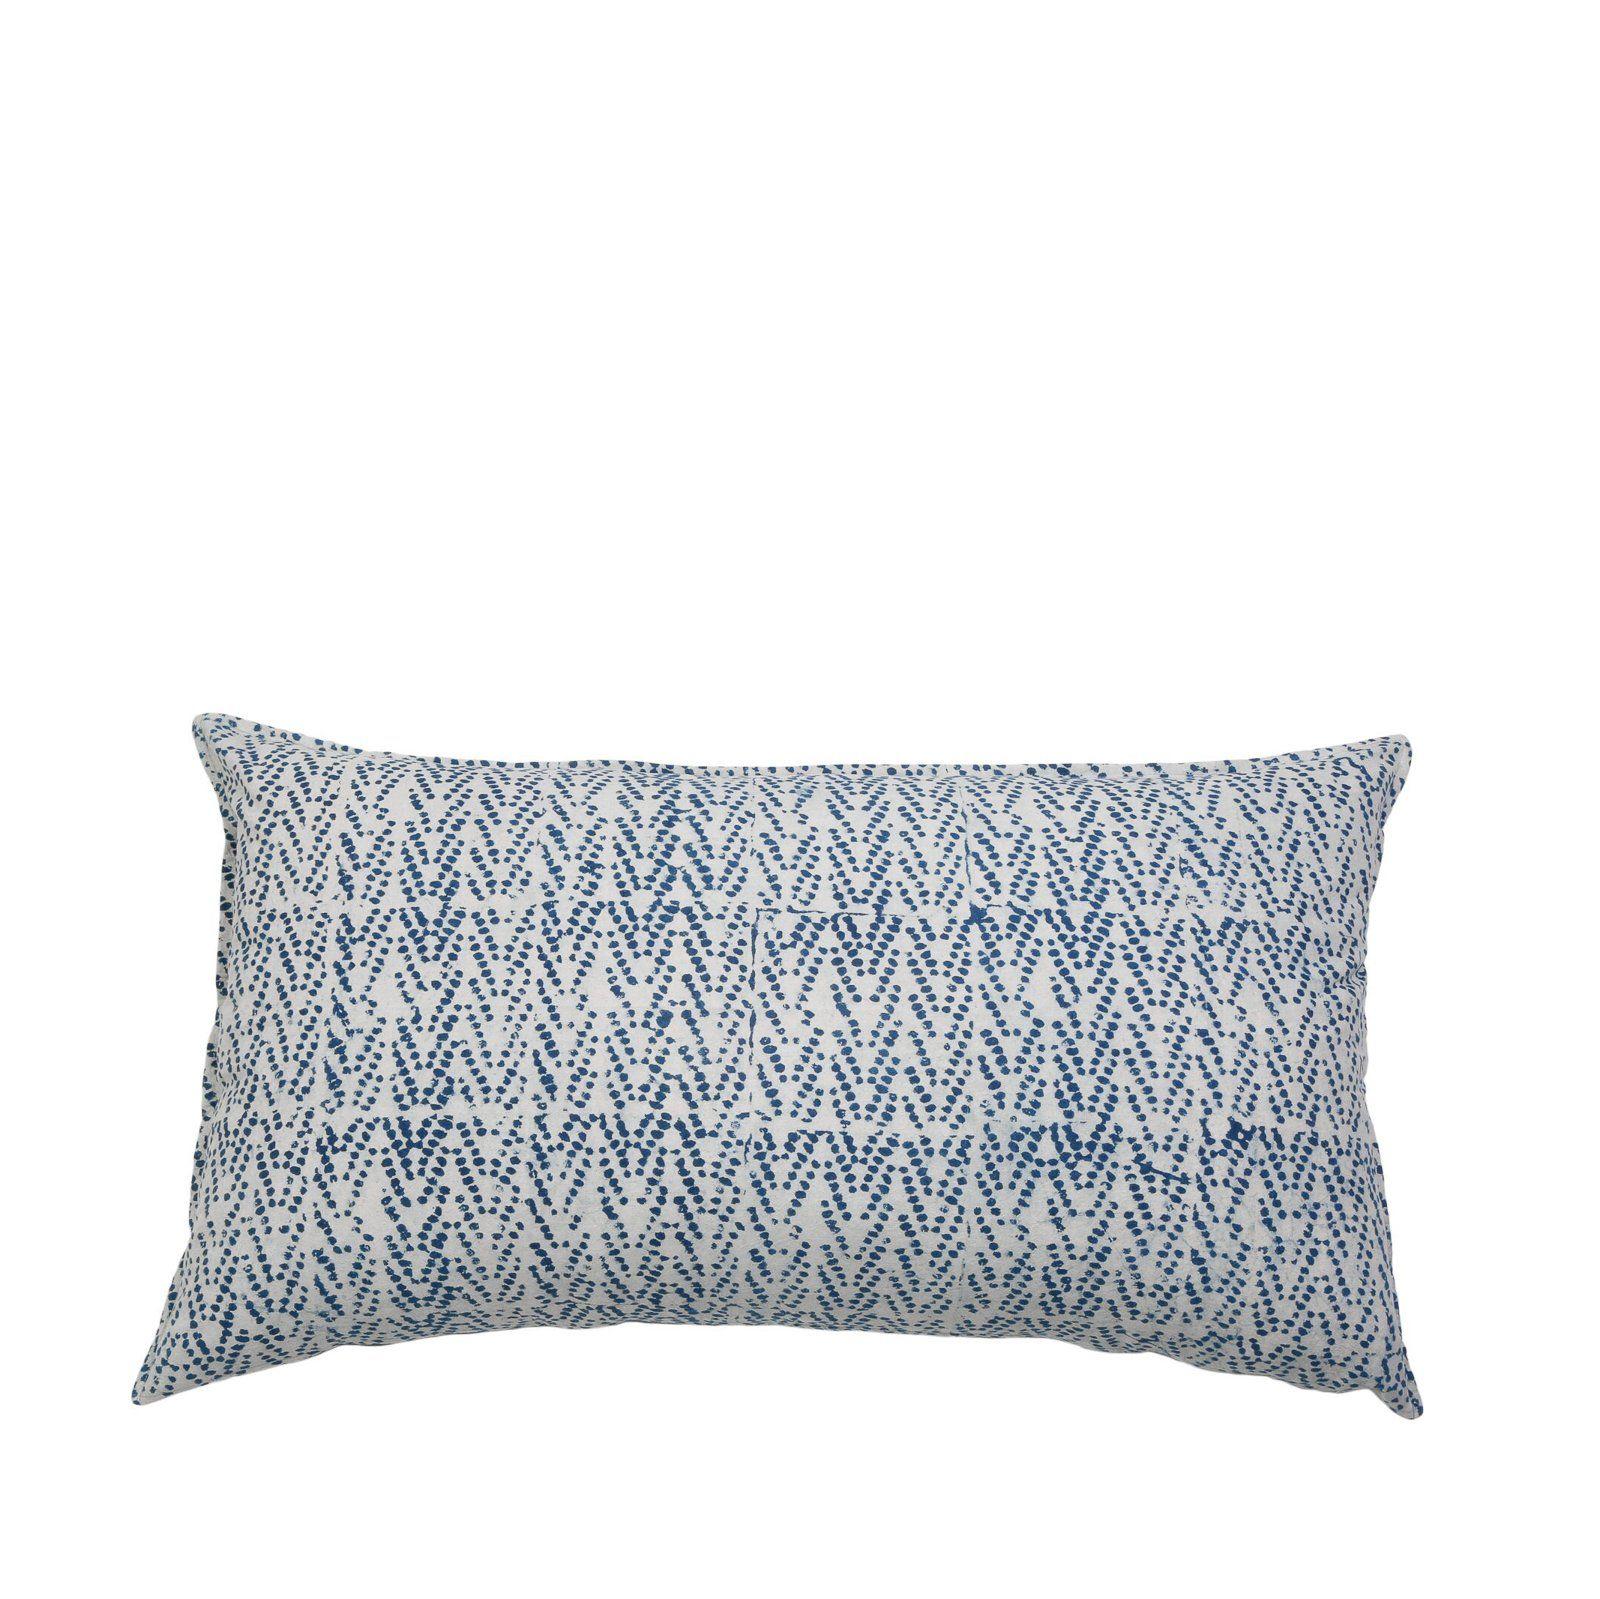 Indigo dots pillow products pinterest pillows dots and indigo